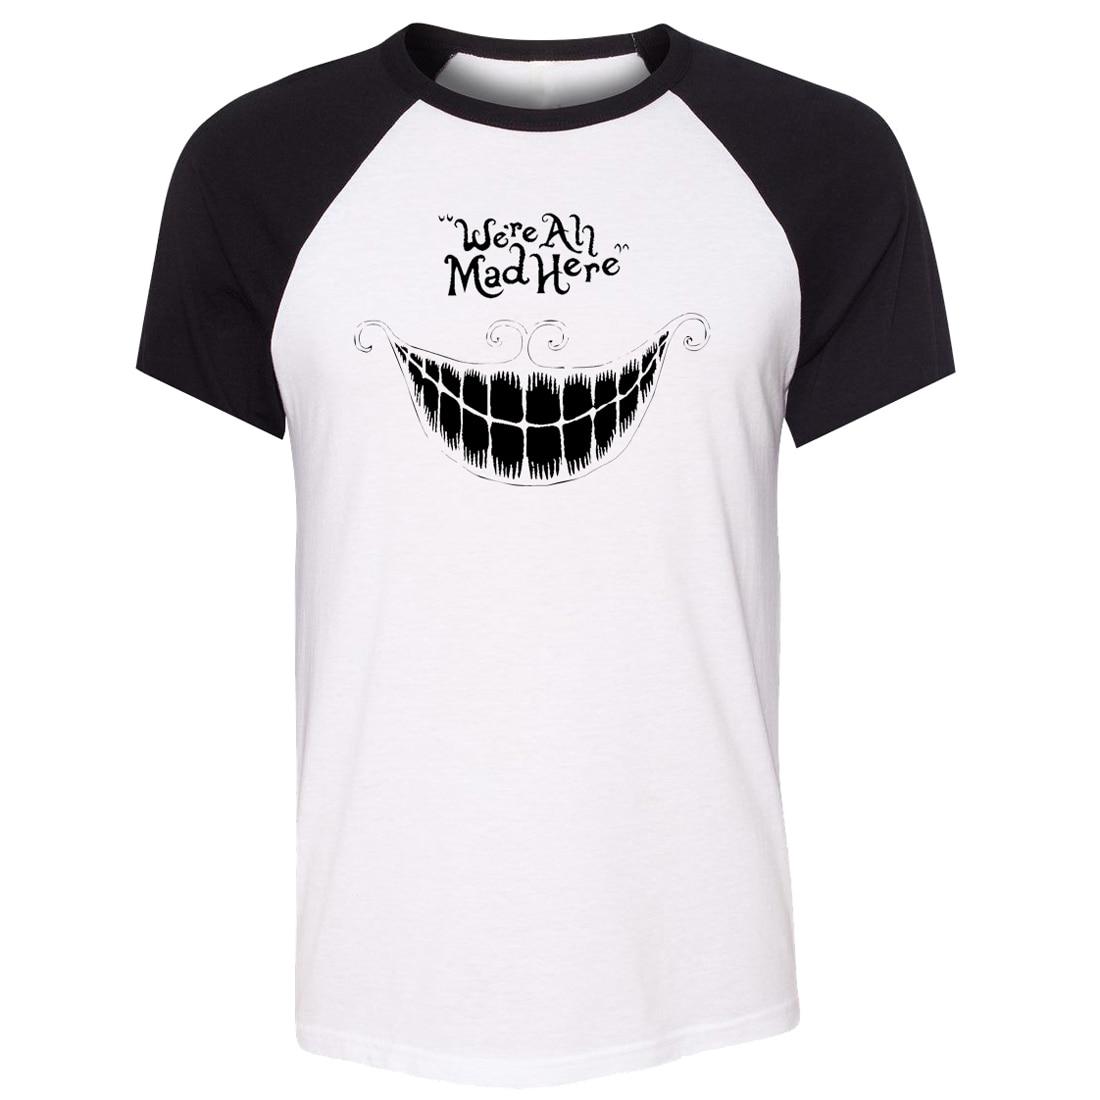 19fd043fb8a iDzn Unisex Summer T-shirt we re all mad here Alice in Wonderland Cheshire  Cat Raglan Short Sleeve Men T shirt Casual Tee Tops